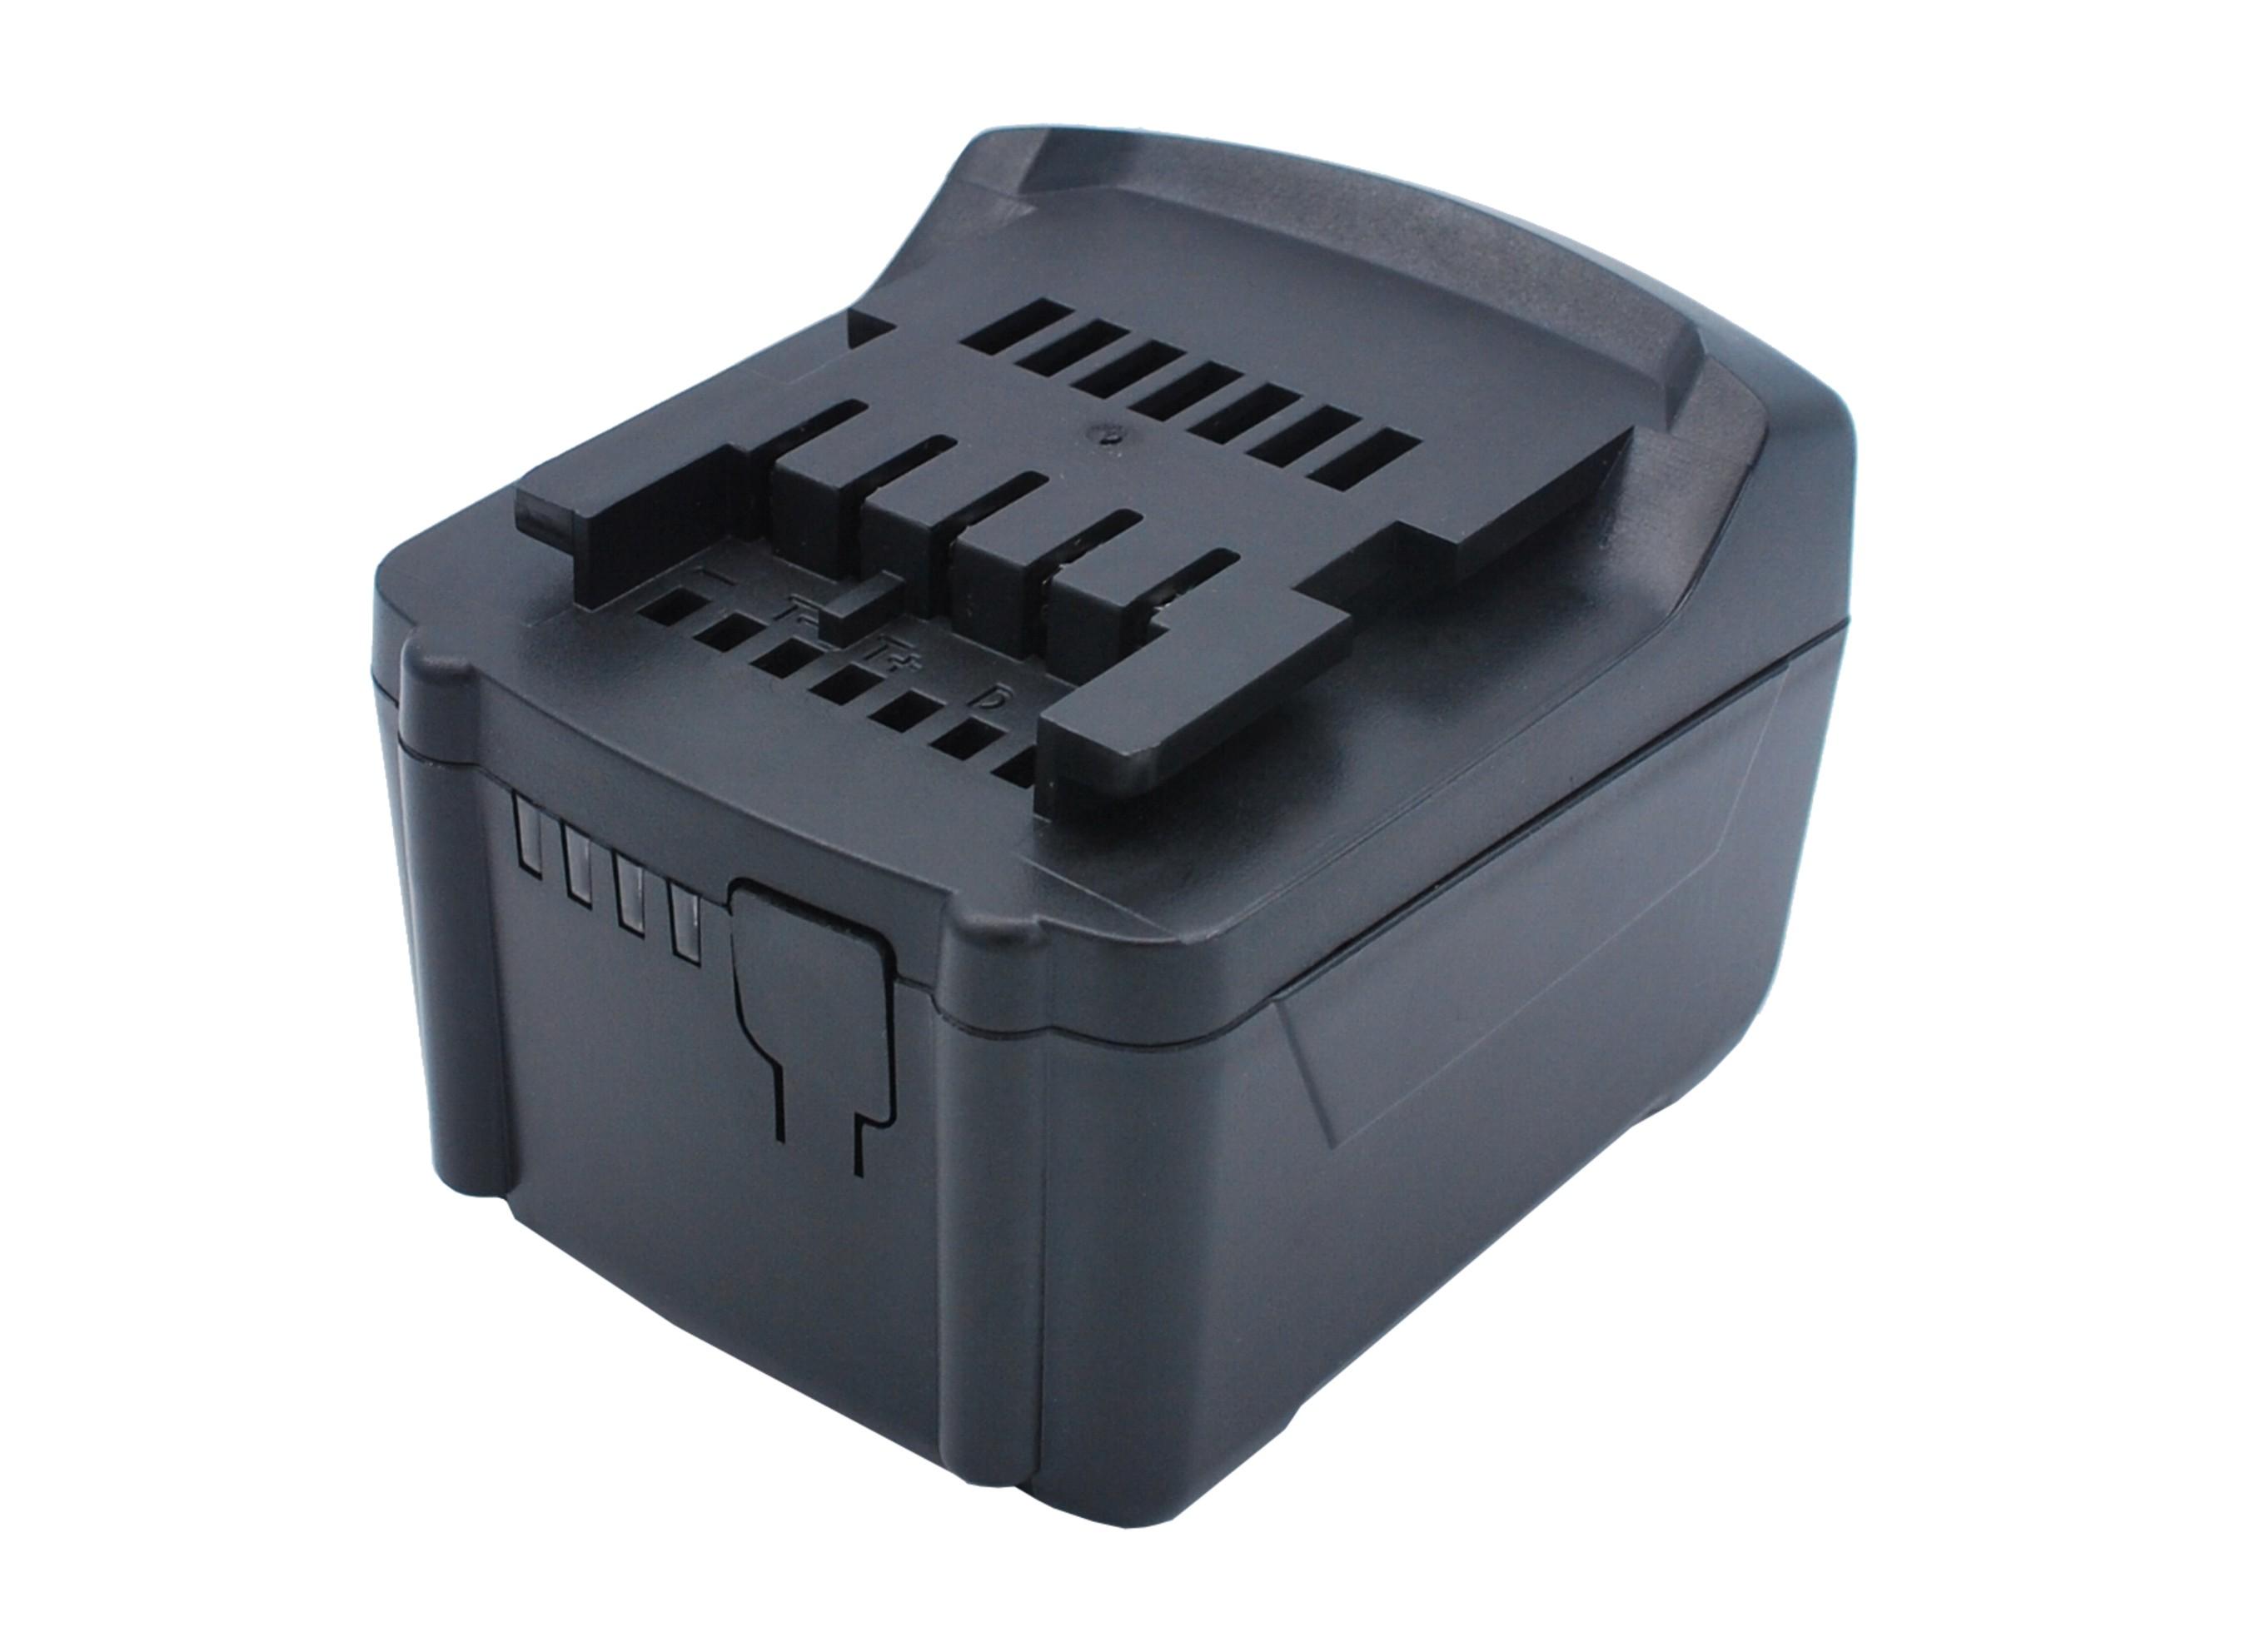 Cameron Sino baterie do nářadí pro METABO BS 14.4 LTX Impuls 6.02143.50 14.4V Li-ion 5000mAh černá - neoriginální